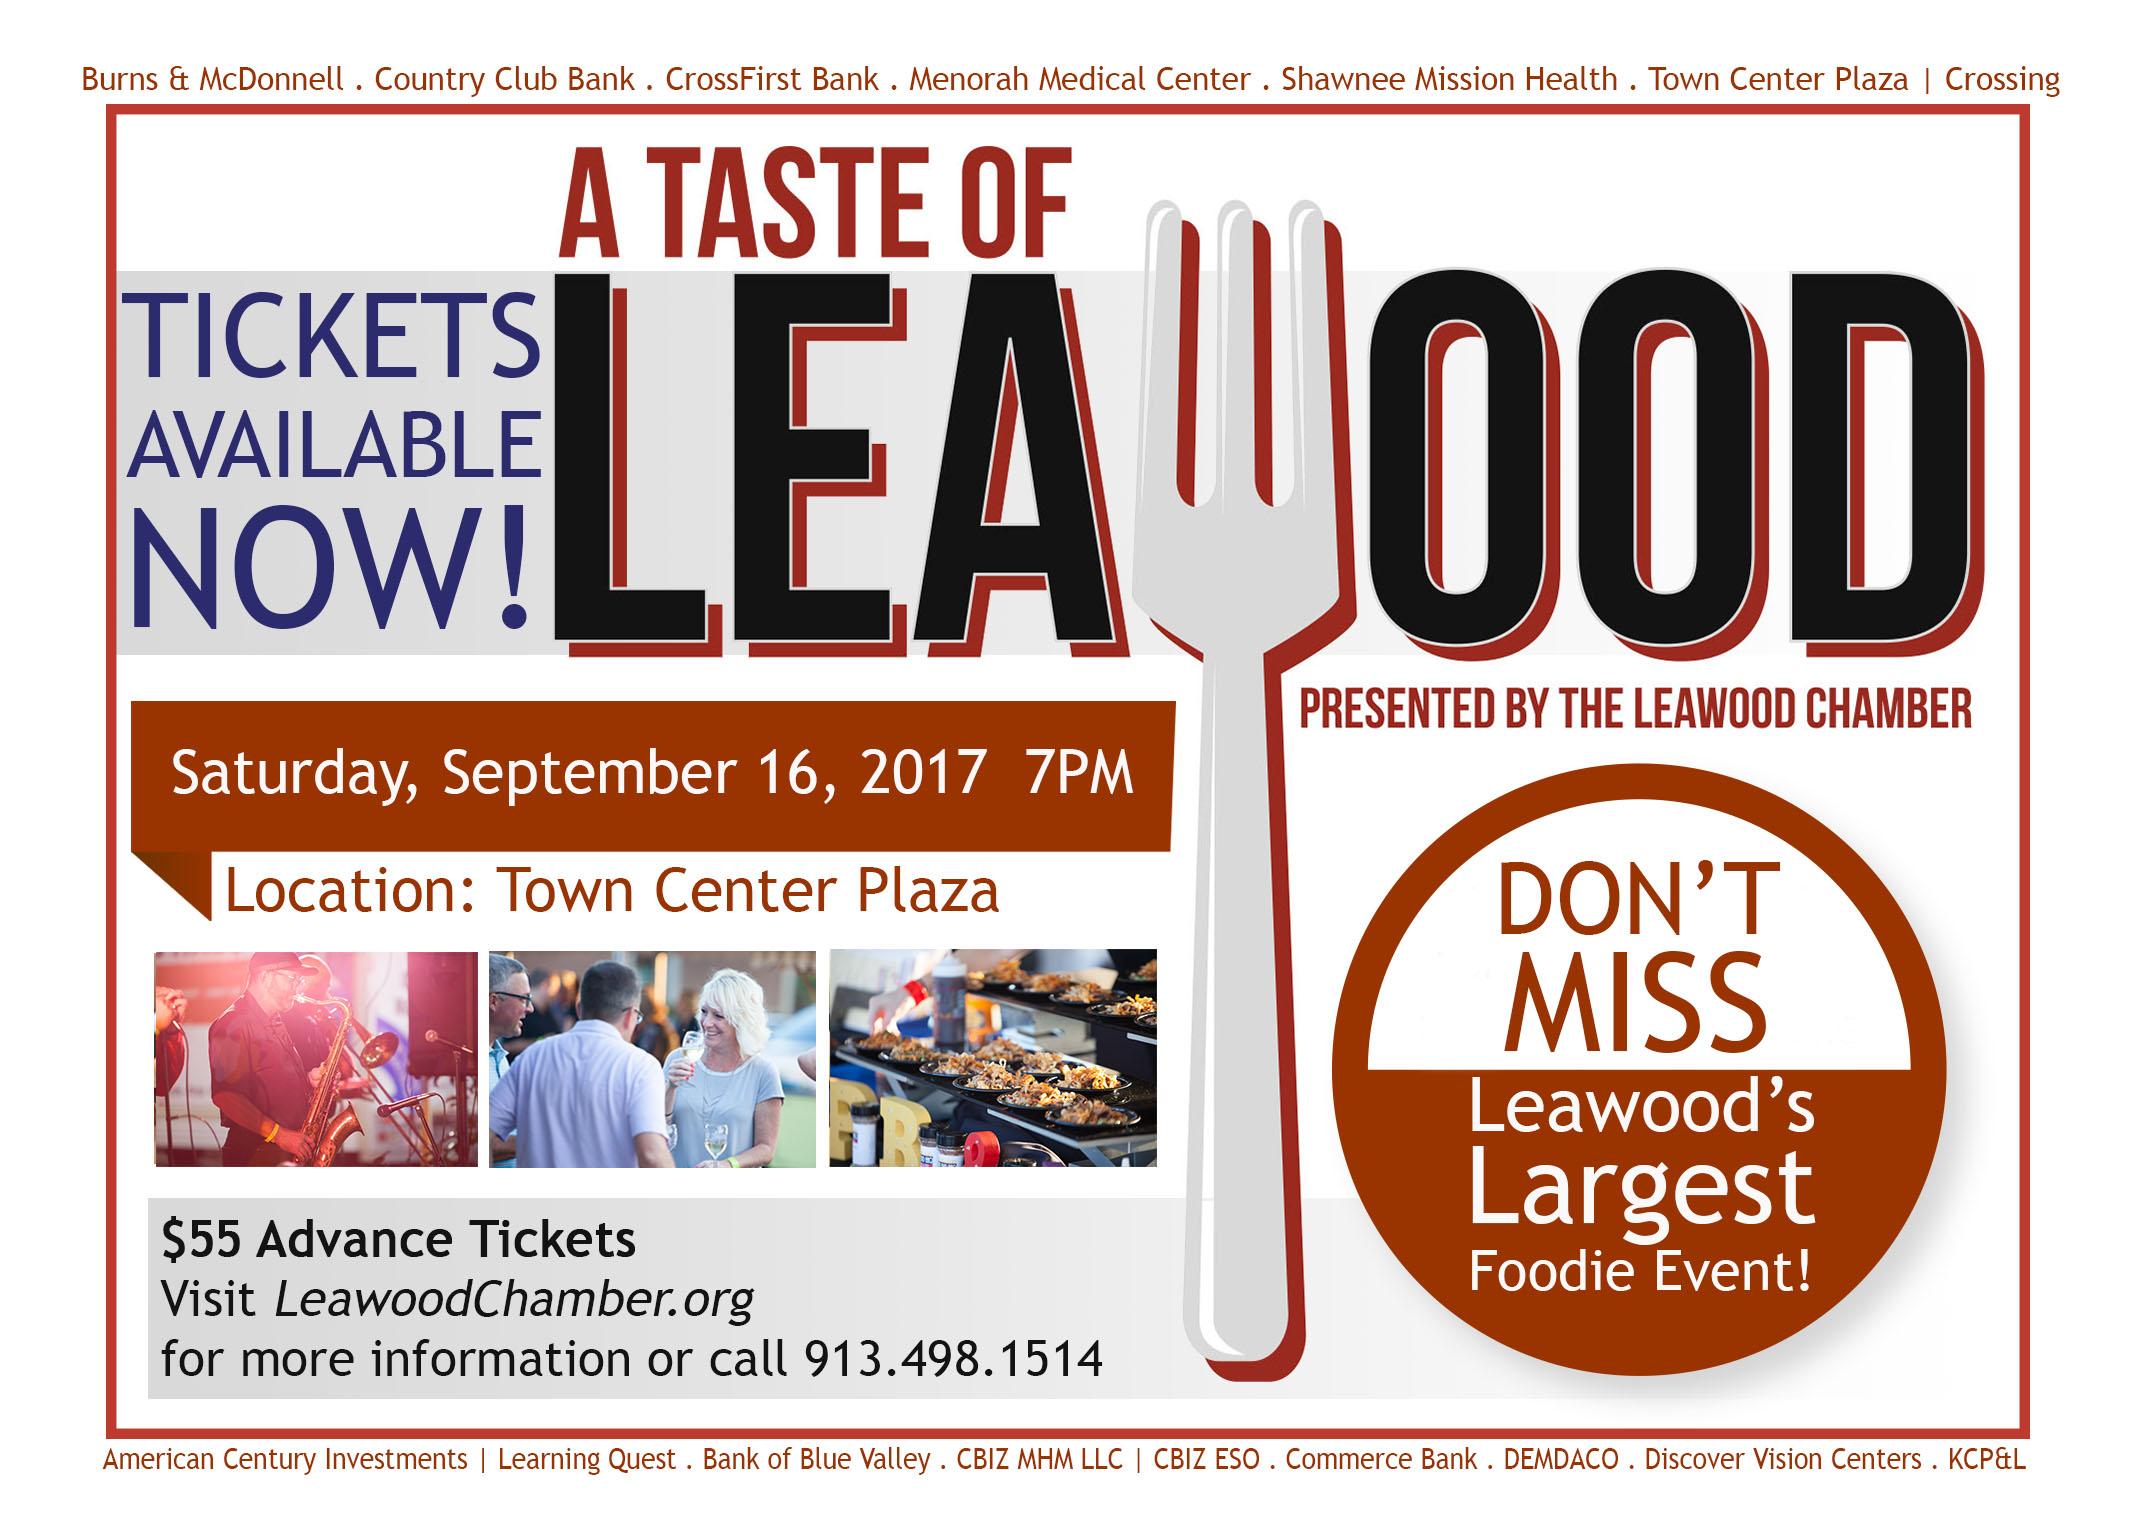 A Taste of Leawood 2017